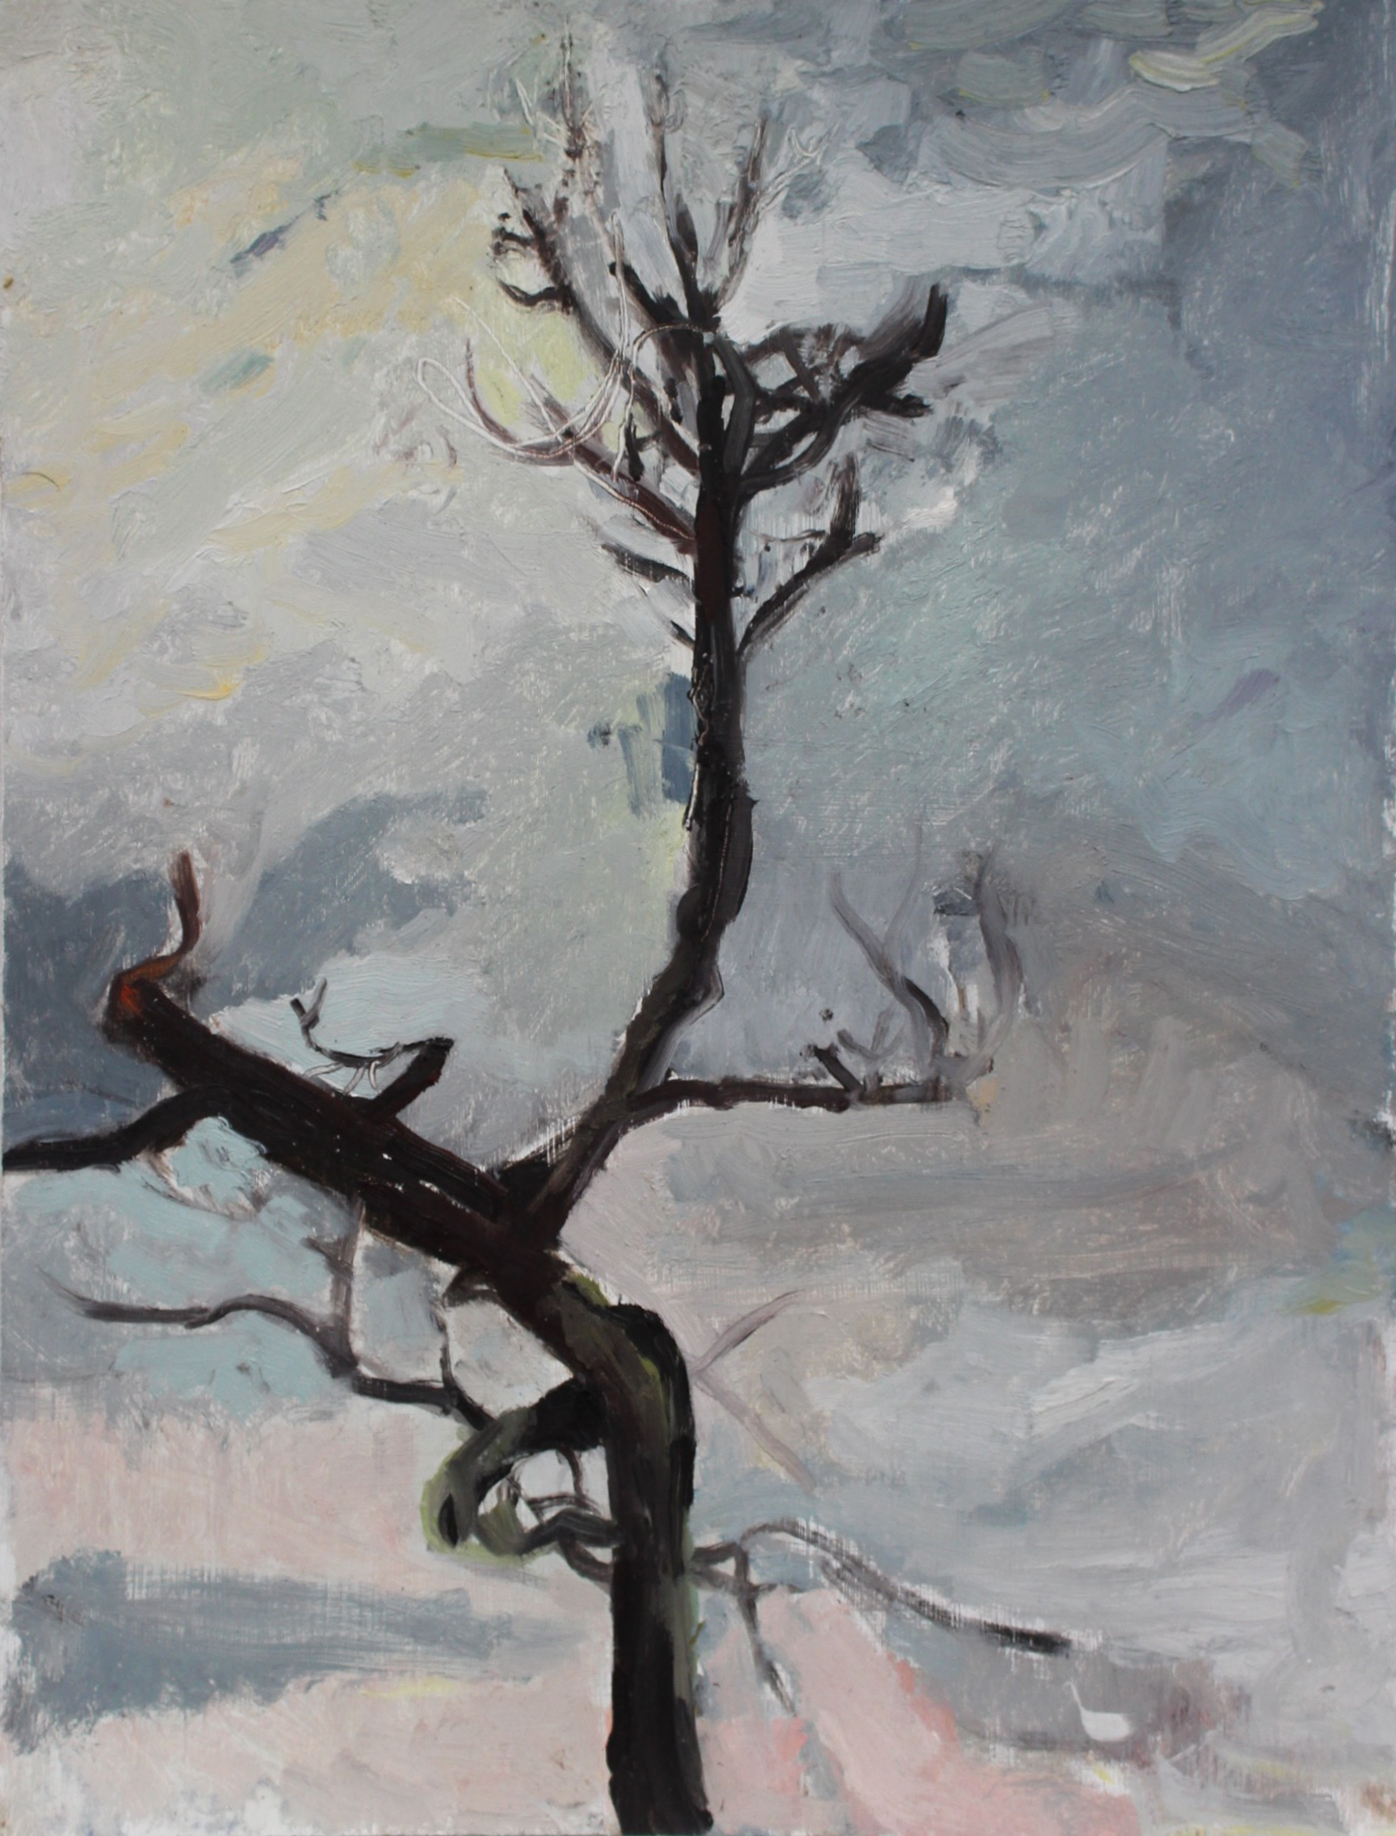 Favorite Tree (Winter)